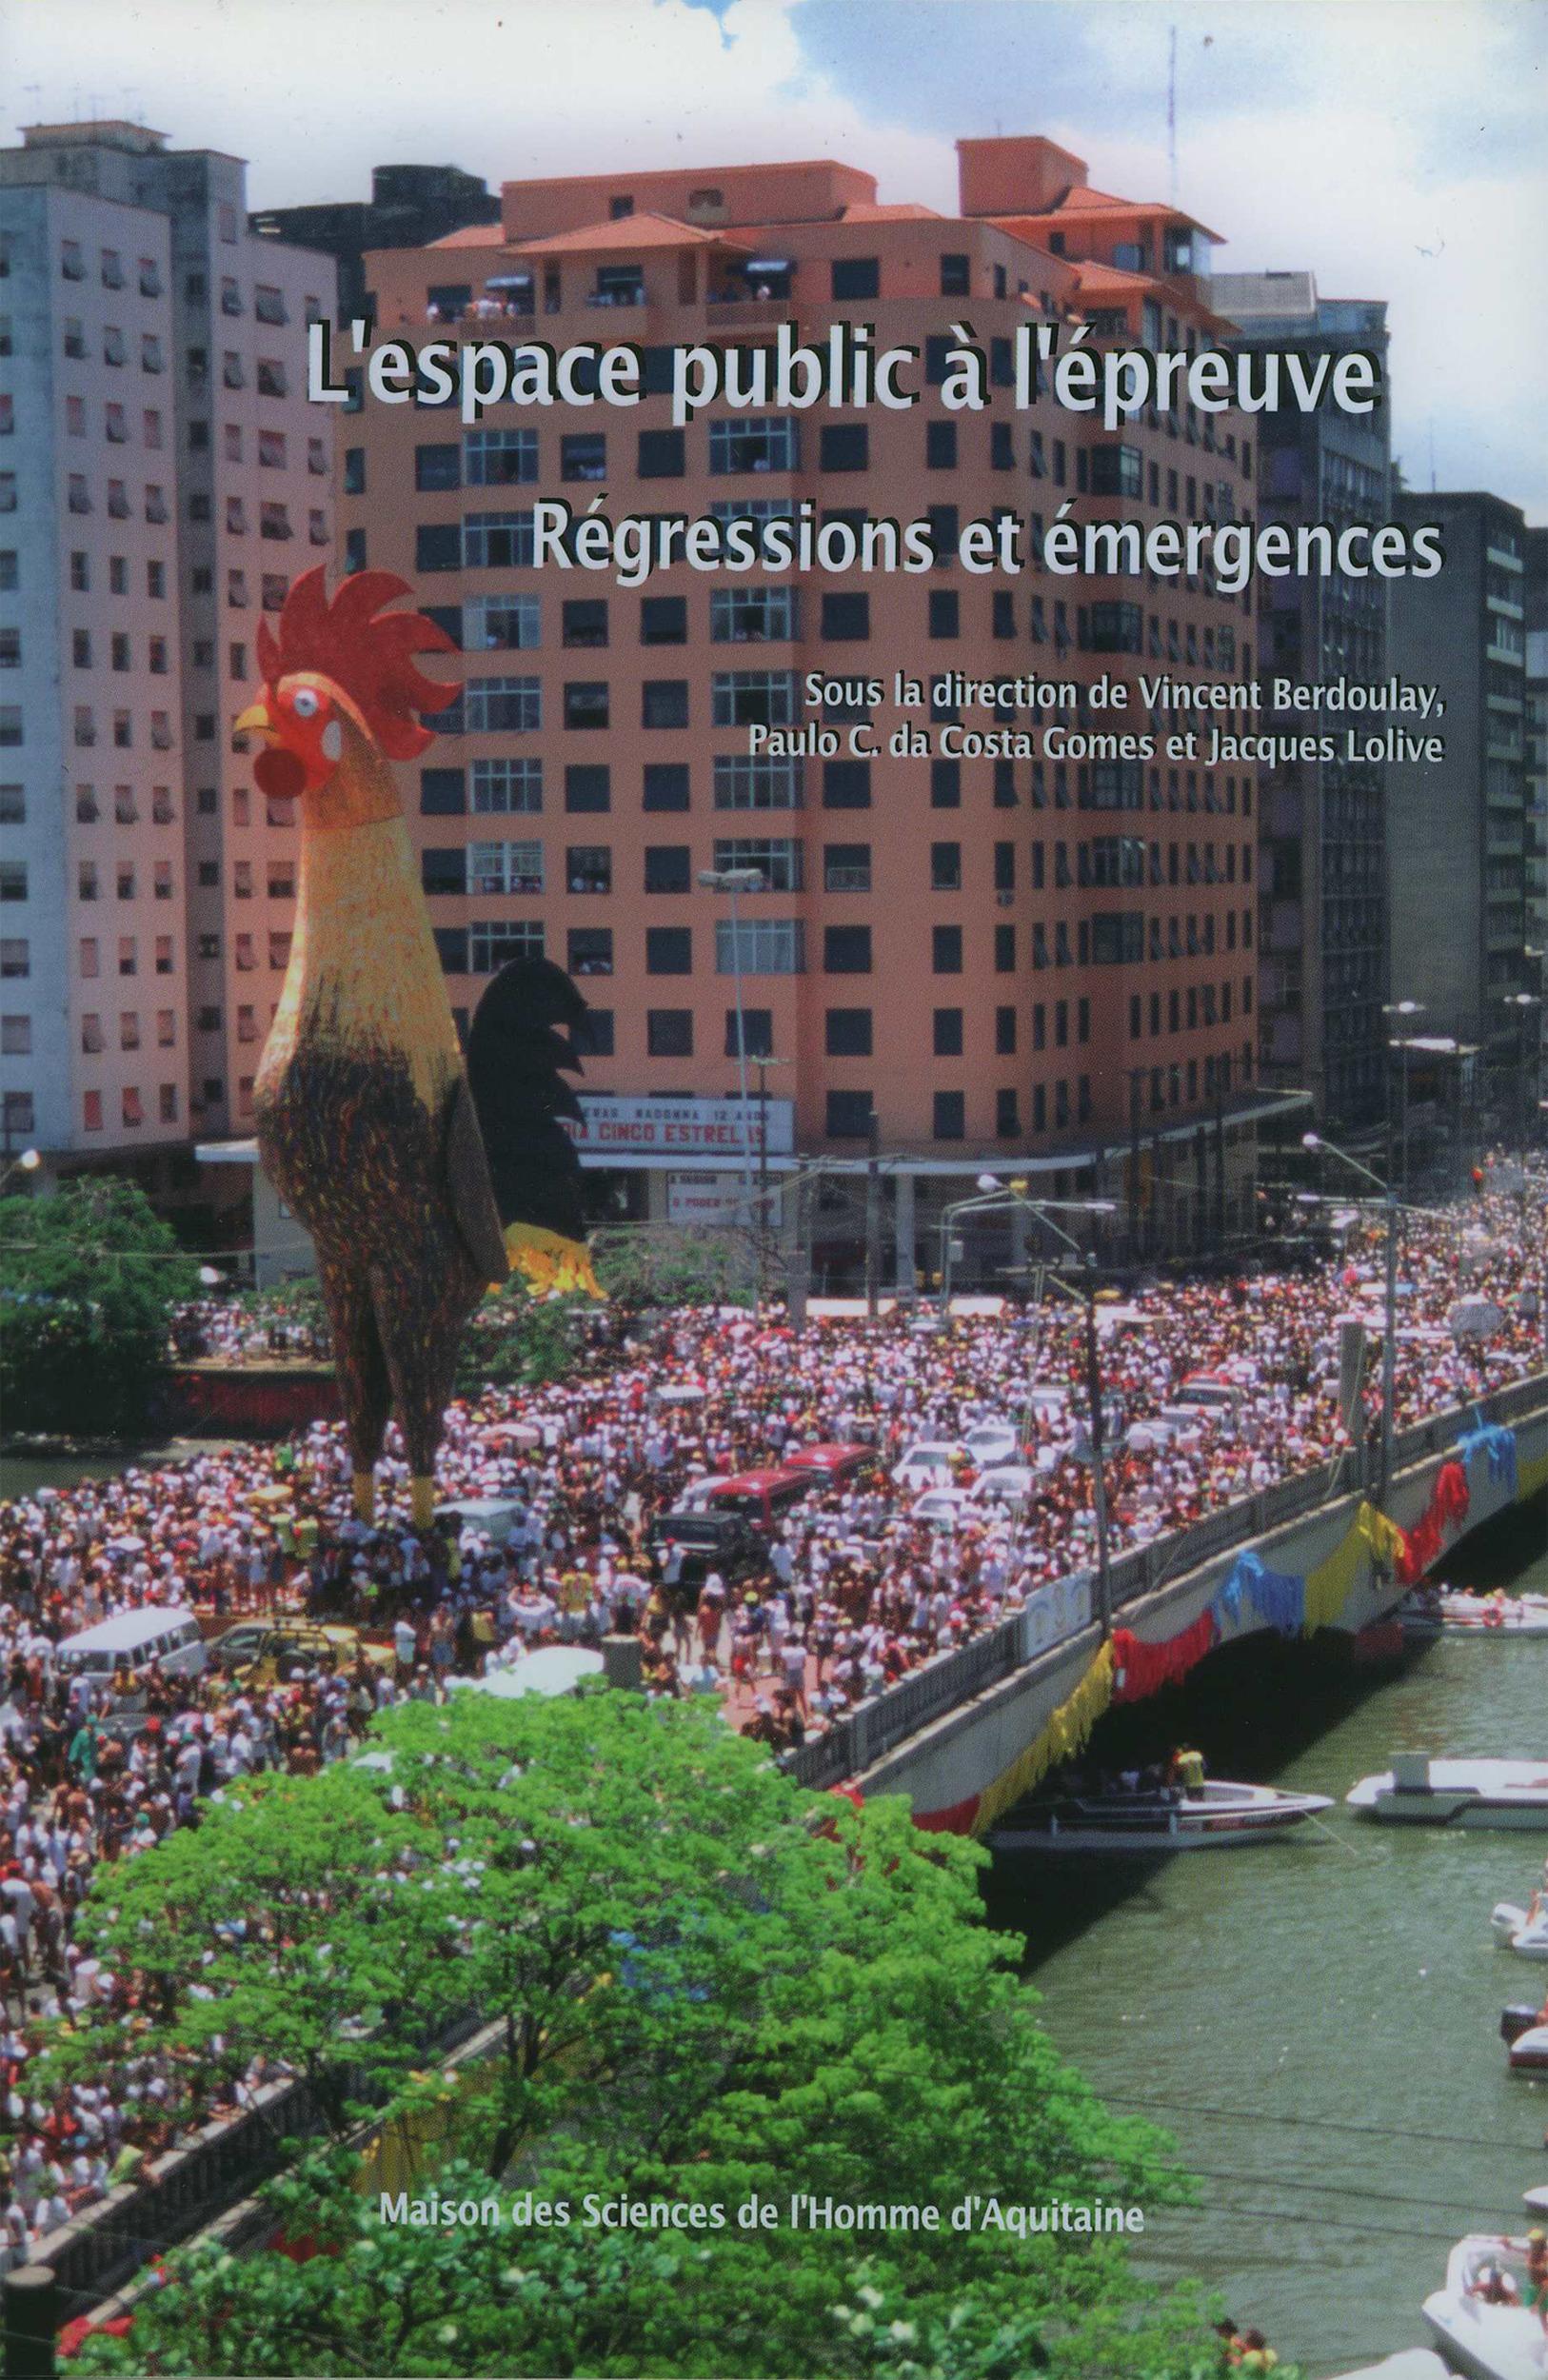 L'espace public a l'epreuve. regressions et emergences